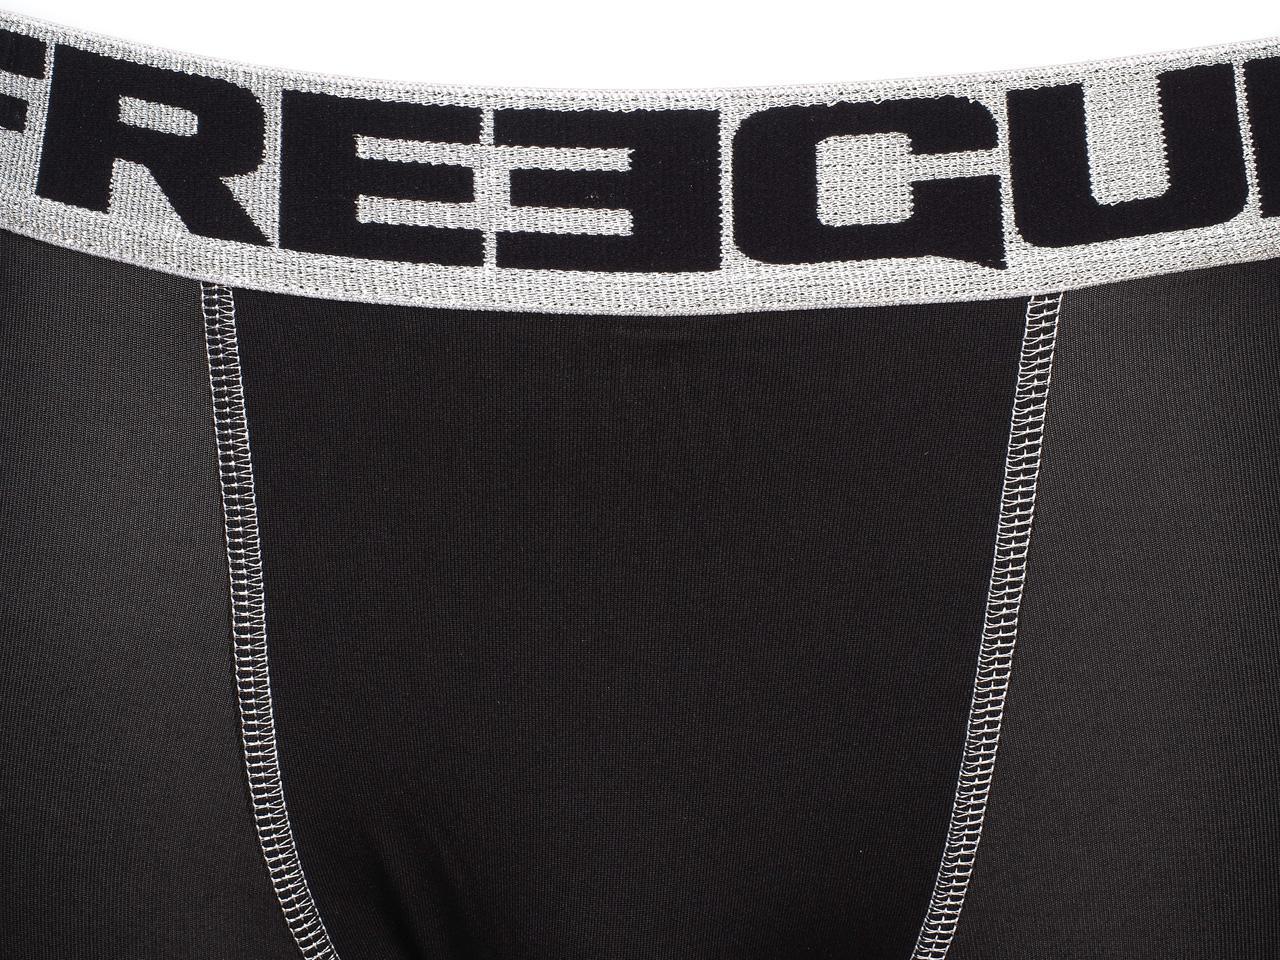 Underwear-Boxer-Freegun-Blacky-Silver-Black-Black-Boxer-26414-New thumbnail 3